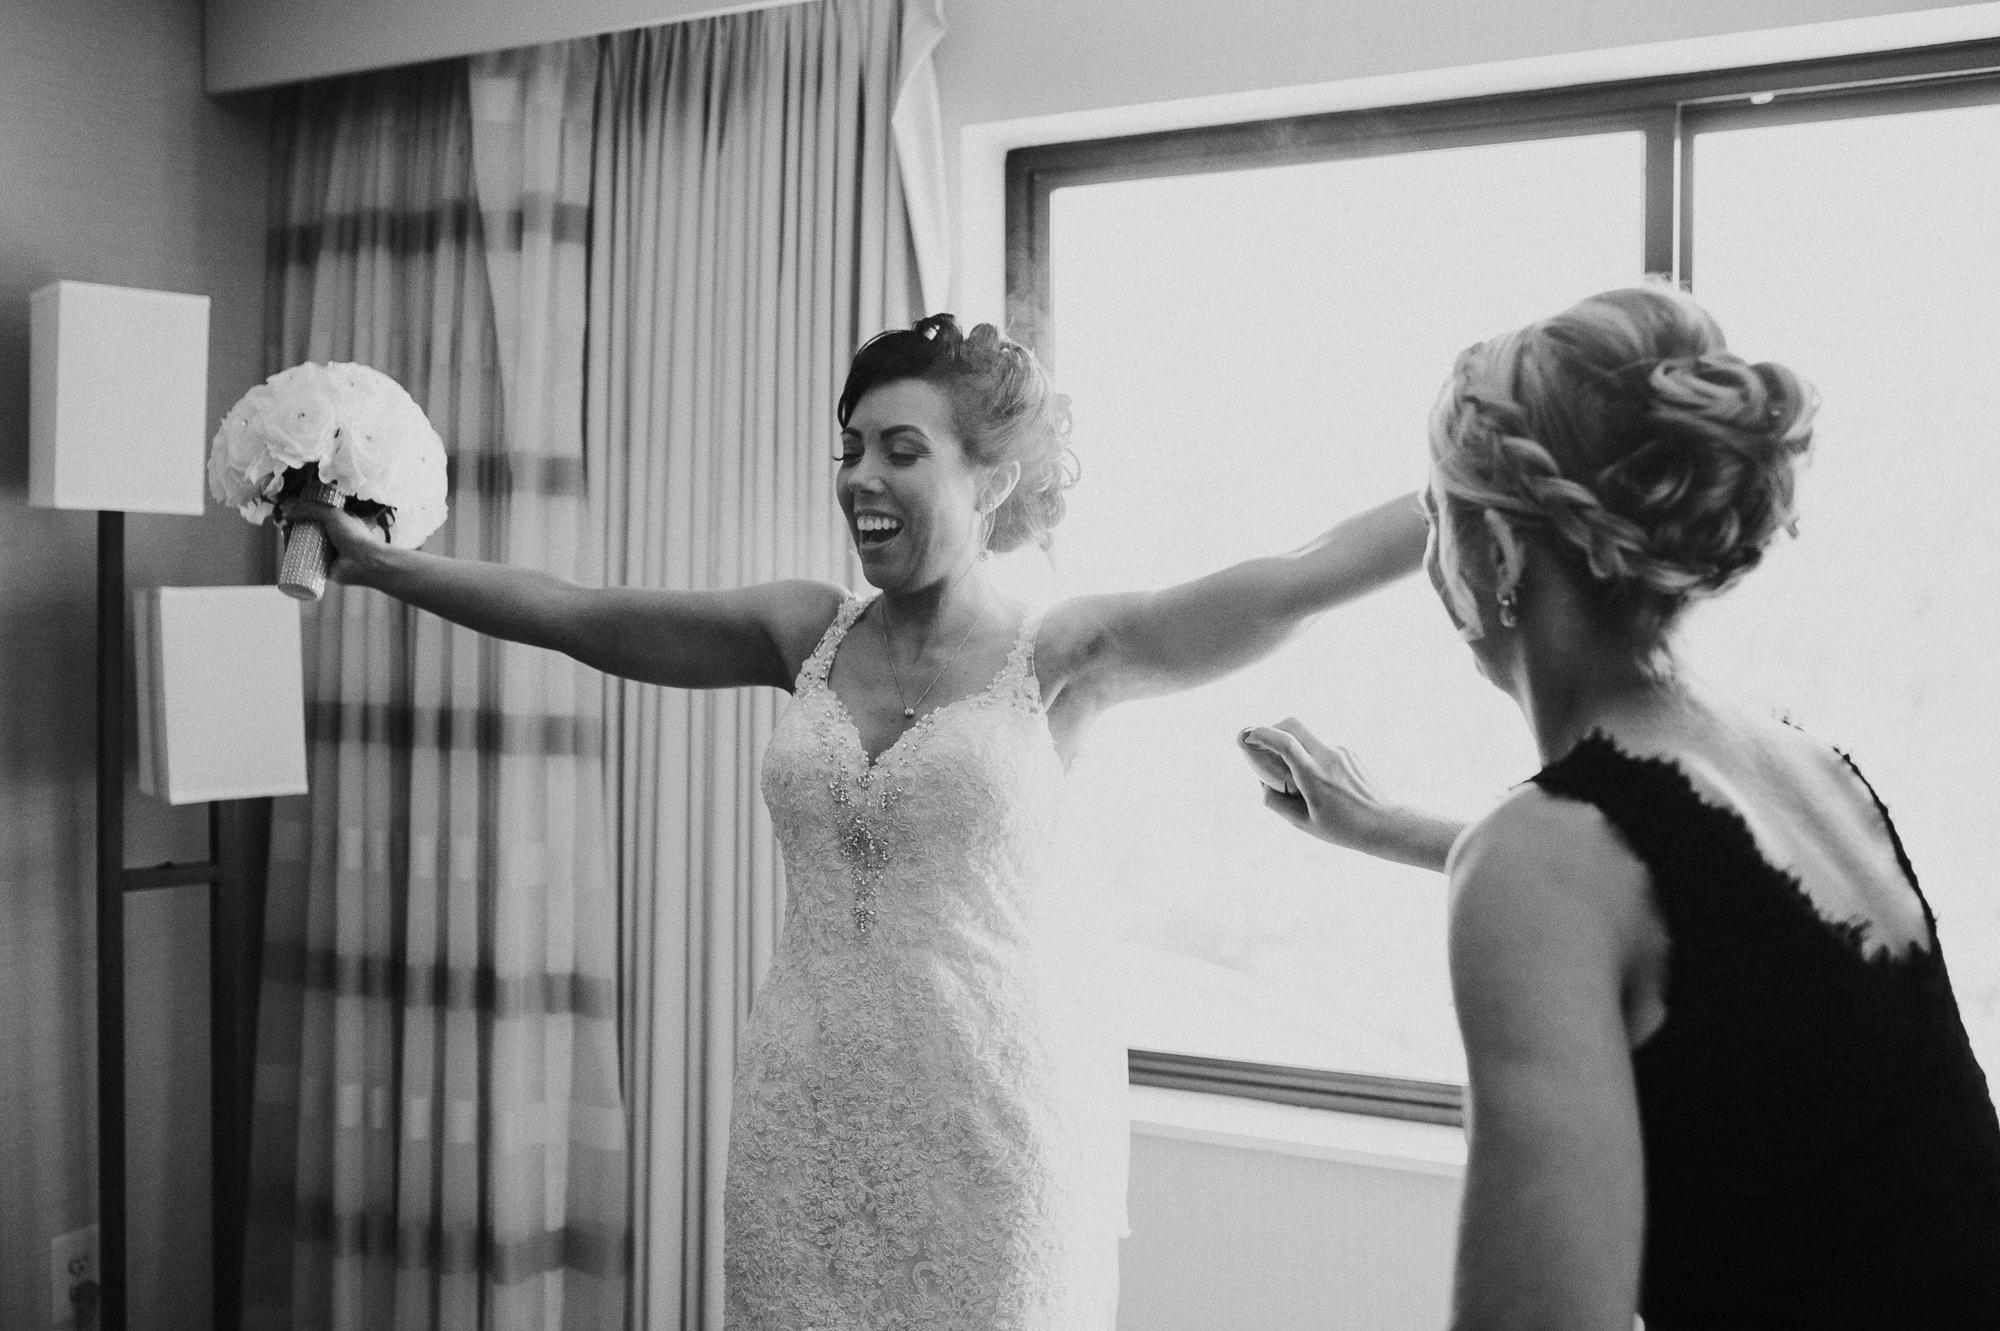 Christina-and-Gene-Wedding-Marla-Rain-Photography-104.jpg